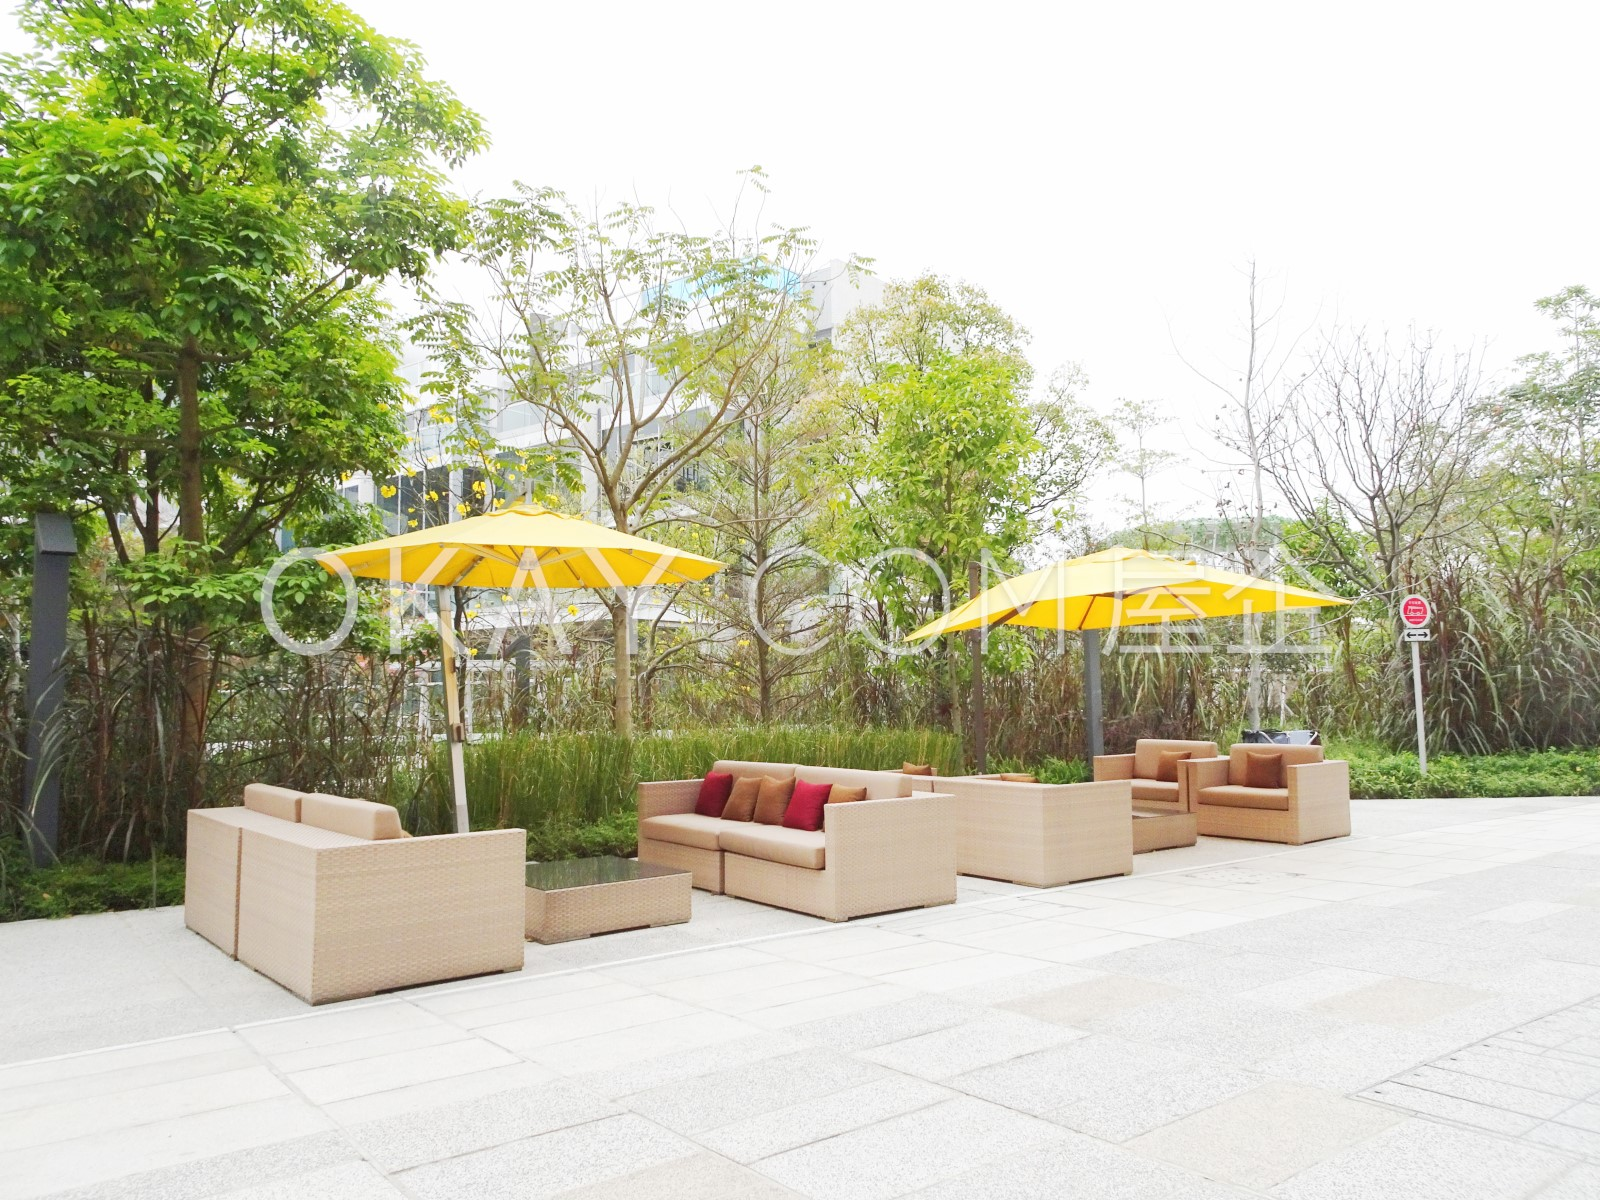 Communal Outdoor Seating